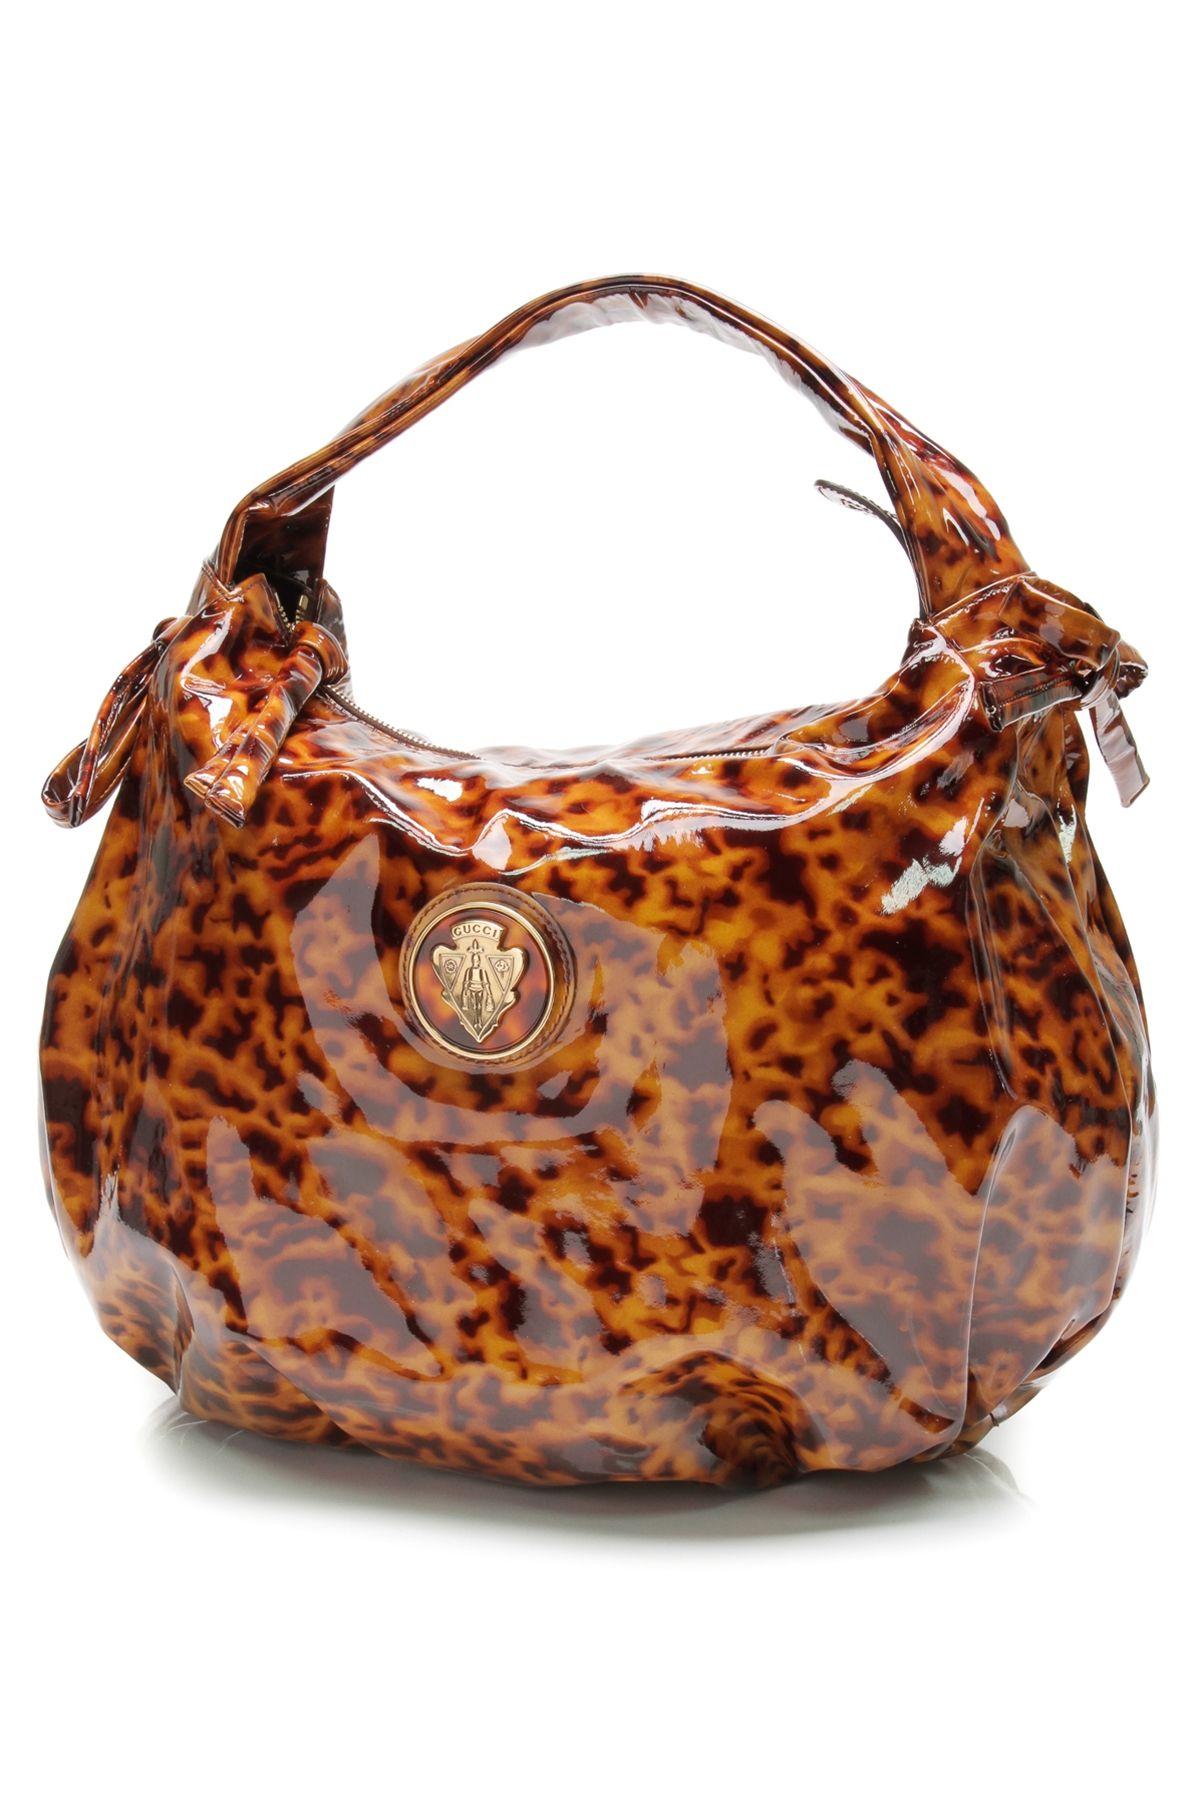 9ed8205e286 Gucci brown tortoiseshell patent leather Hysteria hobo bag